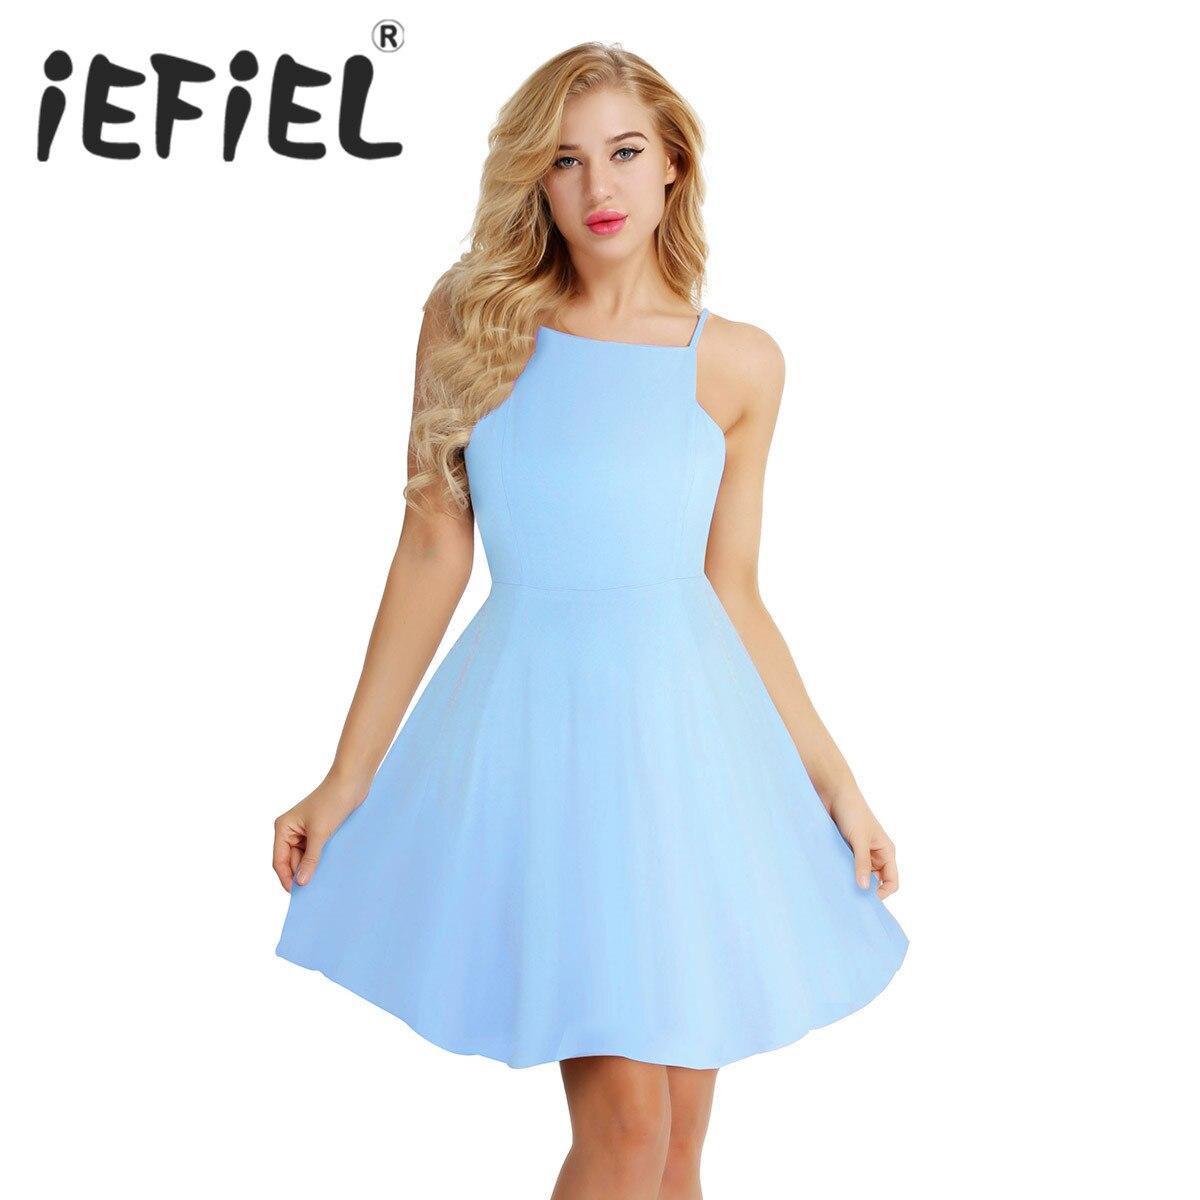 iEFiEL Elegant Sleeveless Bridesmaid Women Ladies Summer Dresses Chiffon Wedding Party Formal Knee Length Prom Pageant Dress